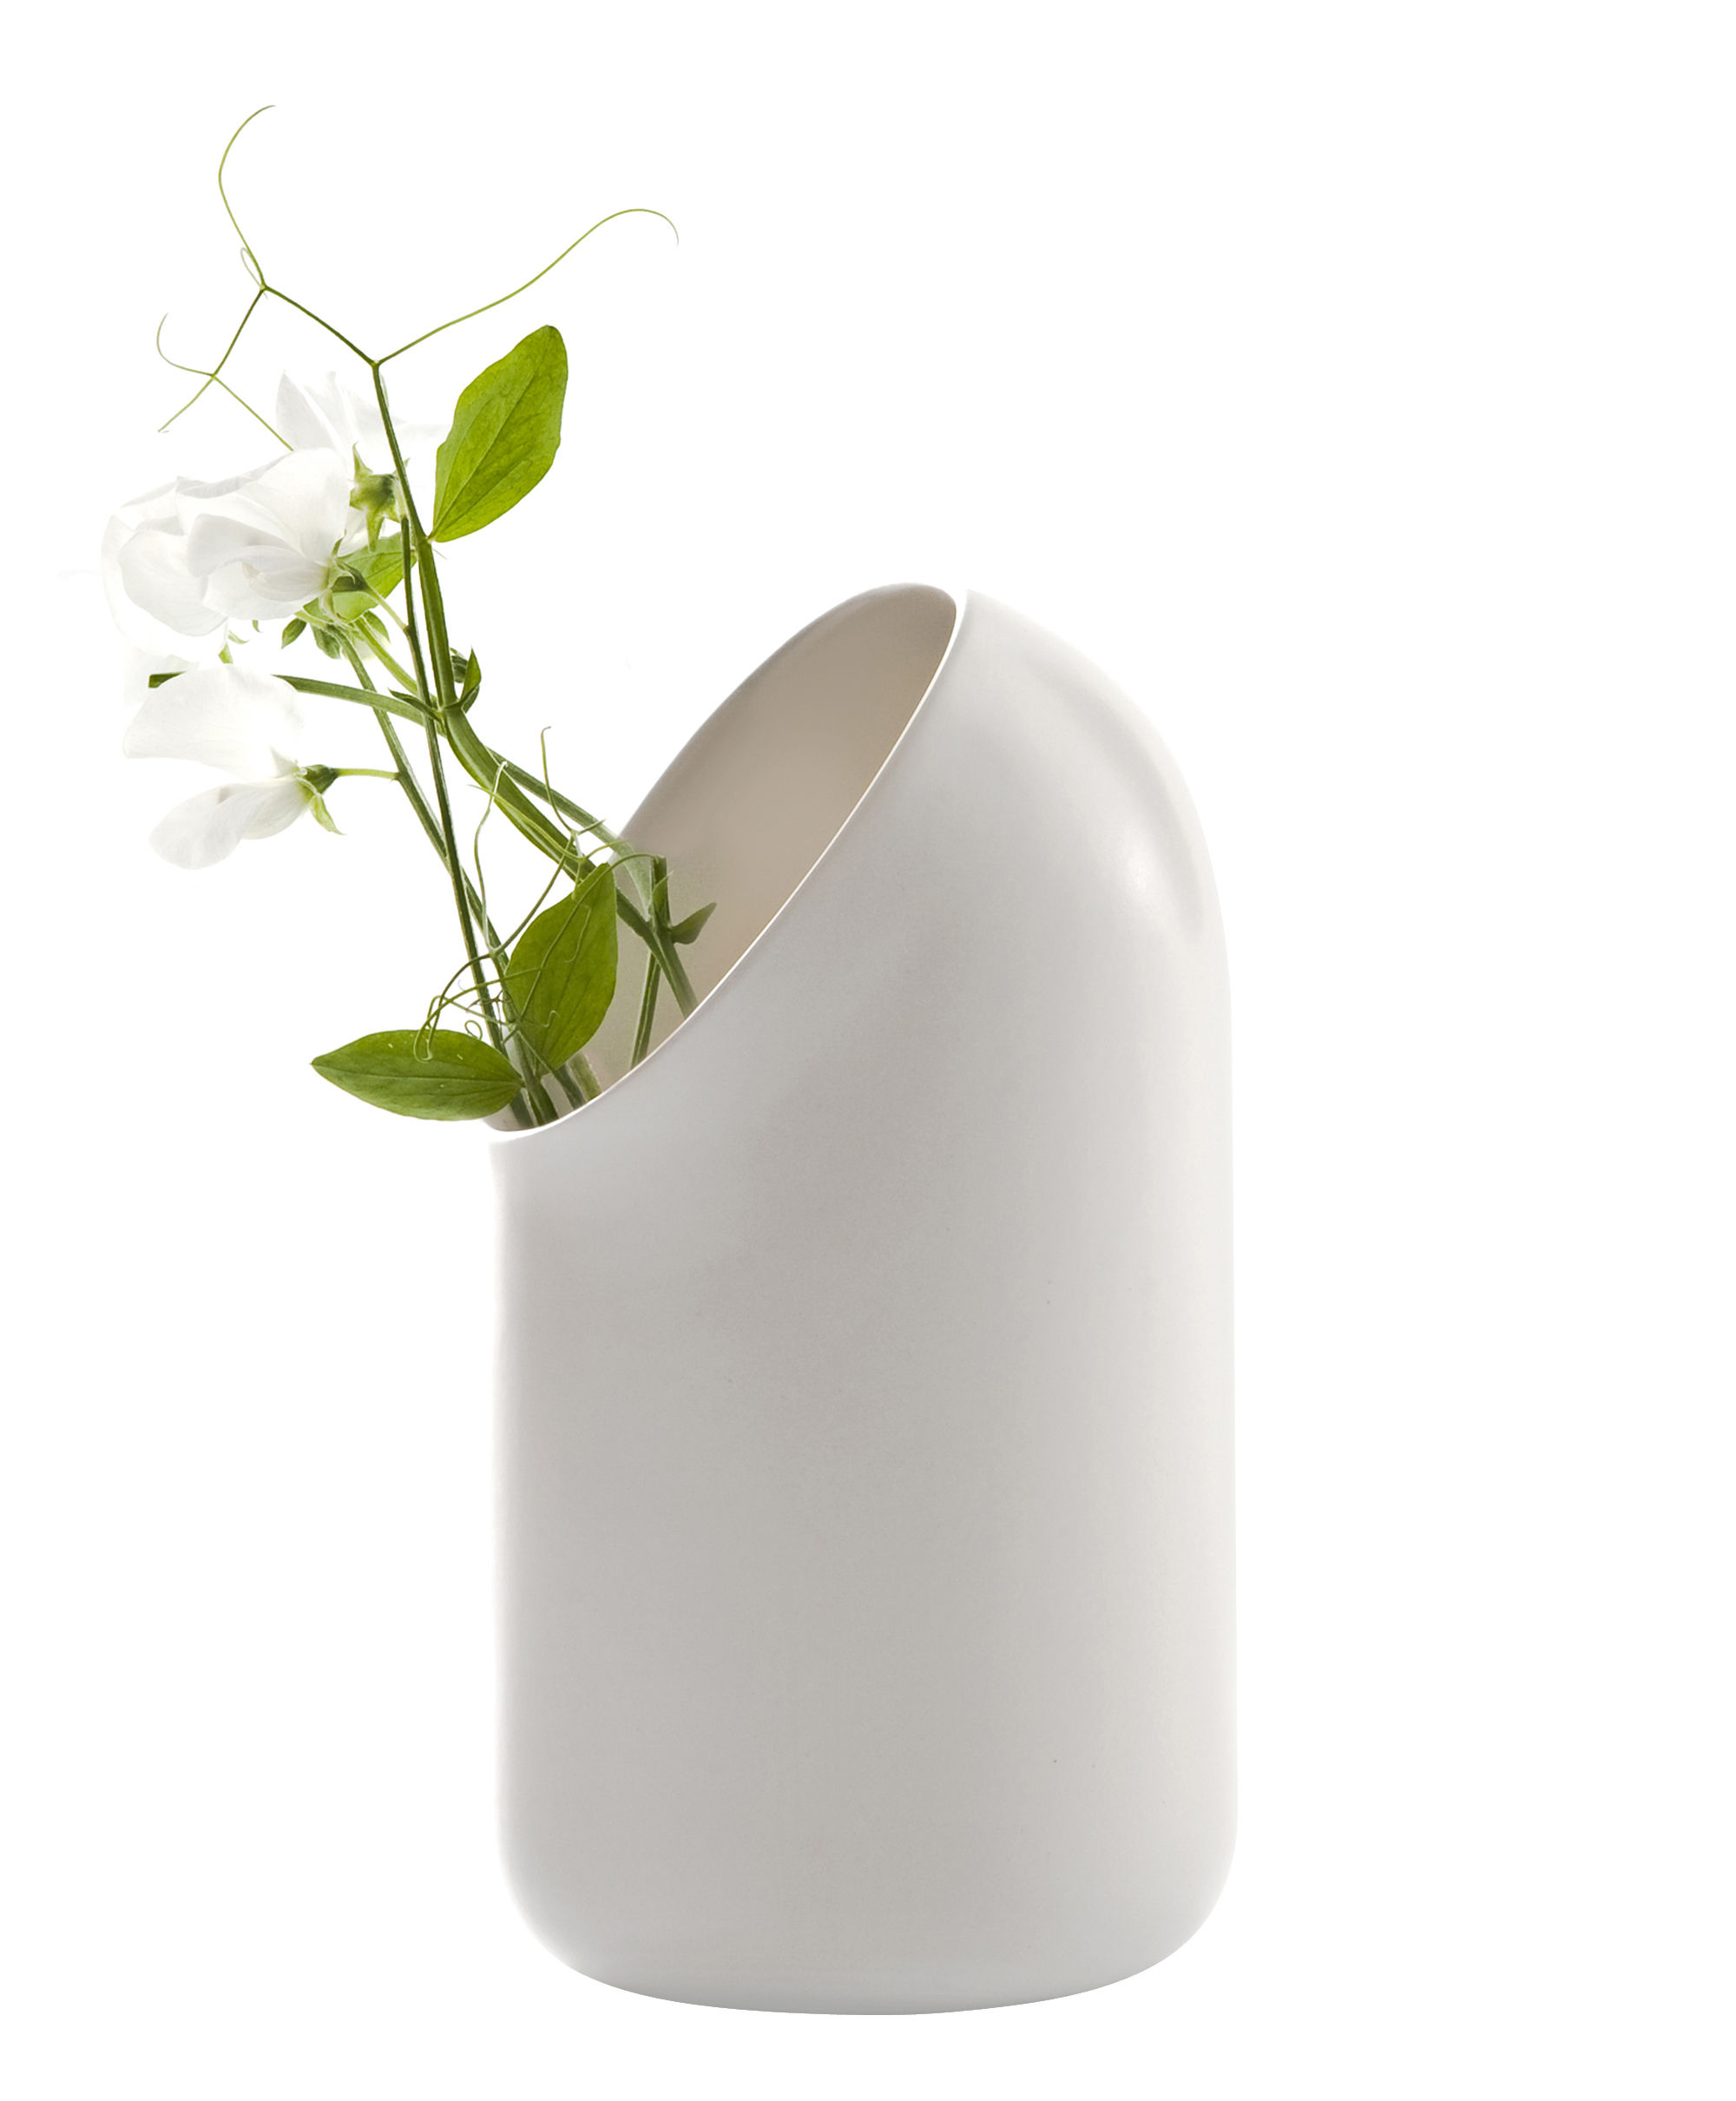 Decoration - Vases - Ô Vase by Moustache - Vase - Ecru - Enamled terracotta